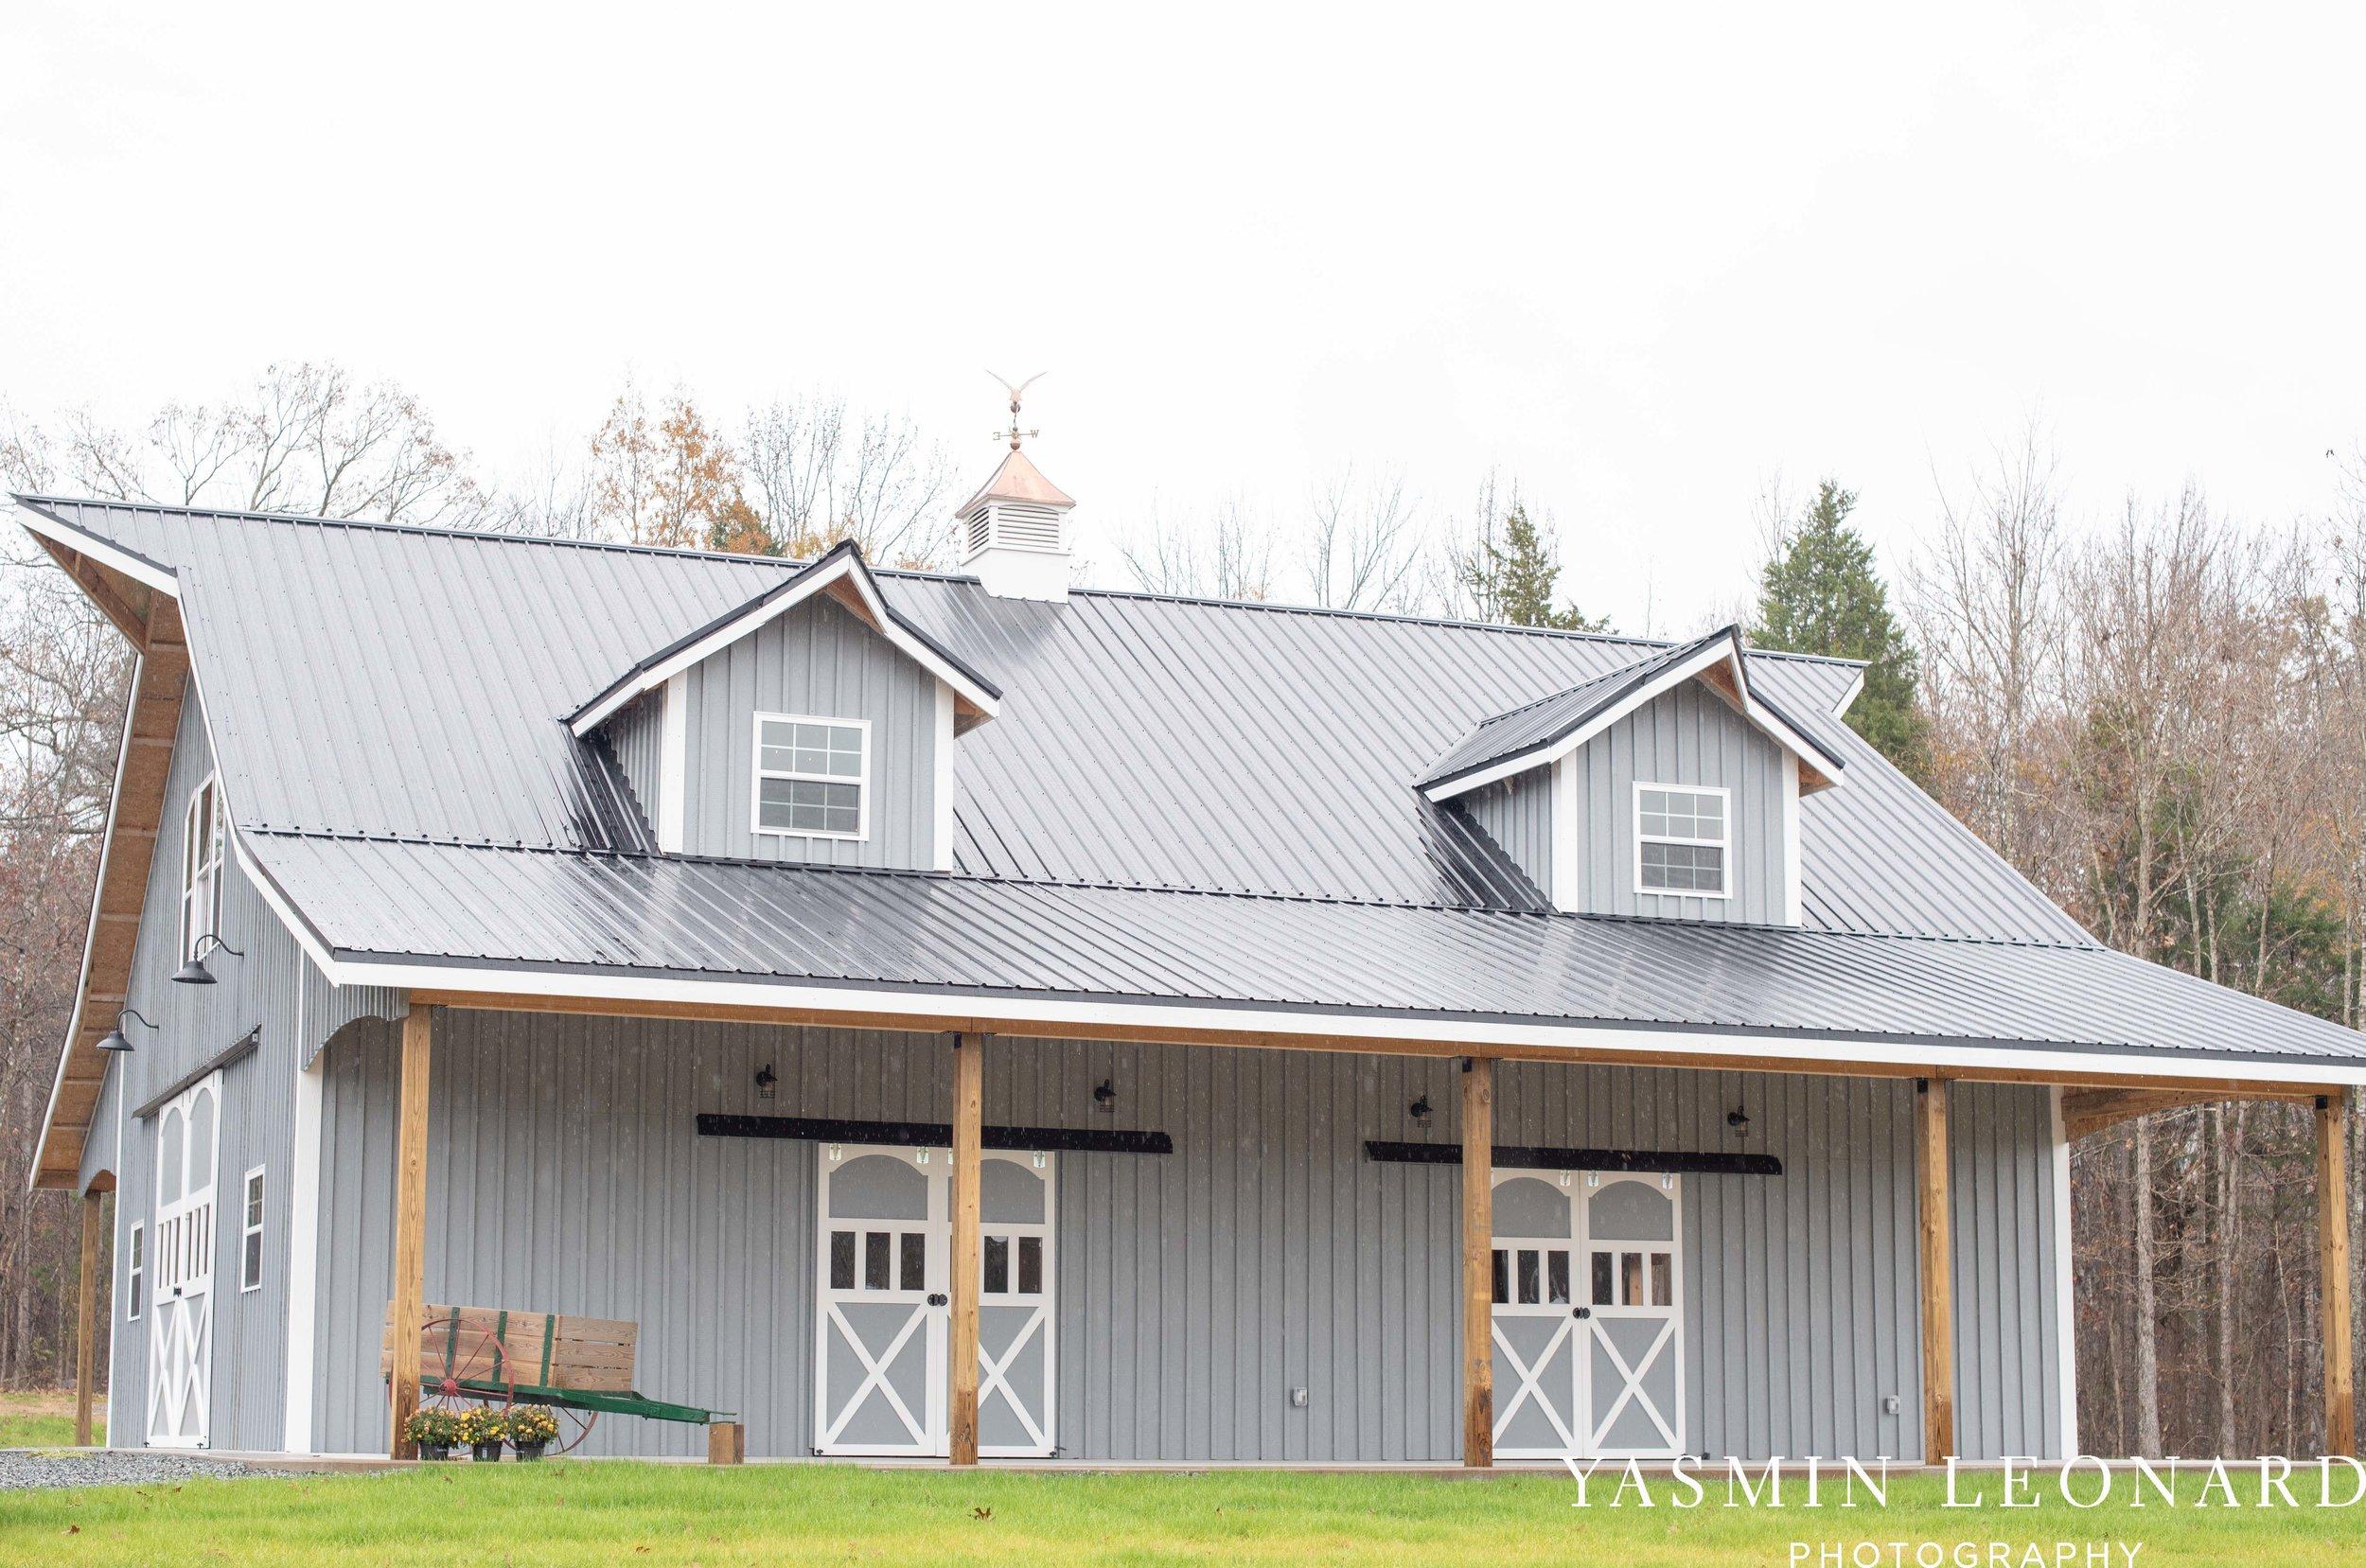 Secret Meadows at Green Dell Farm, NC Barns, NC Wedding Venues, Triad, NC, NC Wedding Photography, Triad Wedding Venues, Affordable Wedding Venues, NEW Wedding Venues, Christmas Weddings-1.jpg